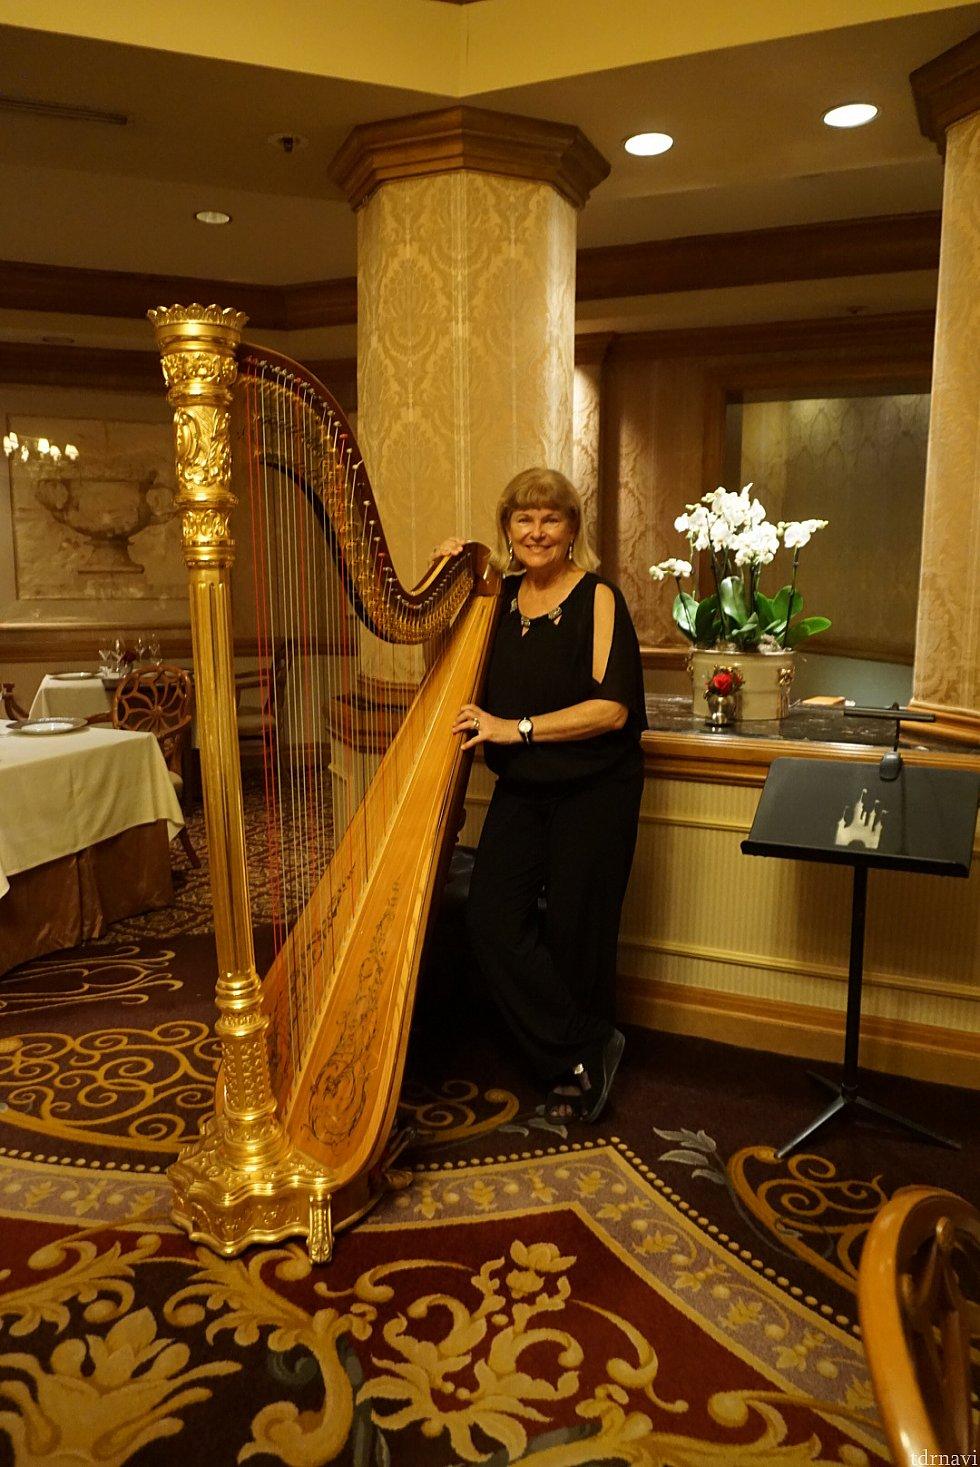 BGMは生のハープ演奏。本当にロマンティックな空間を作り出してくれました。